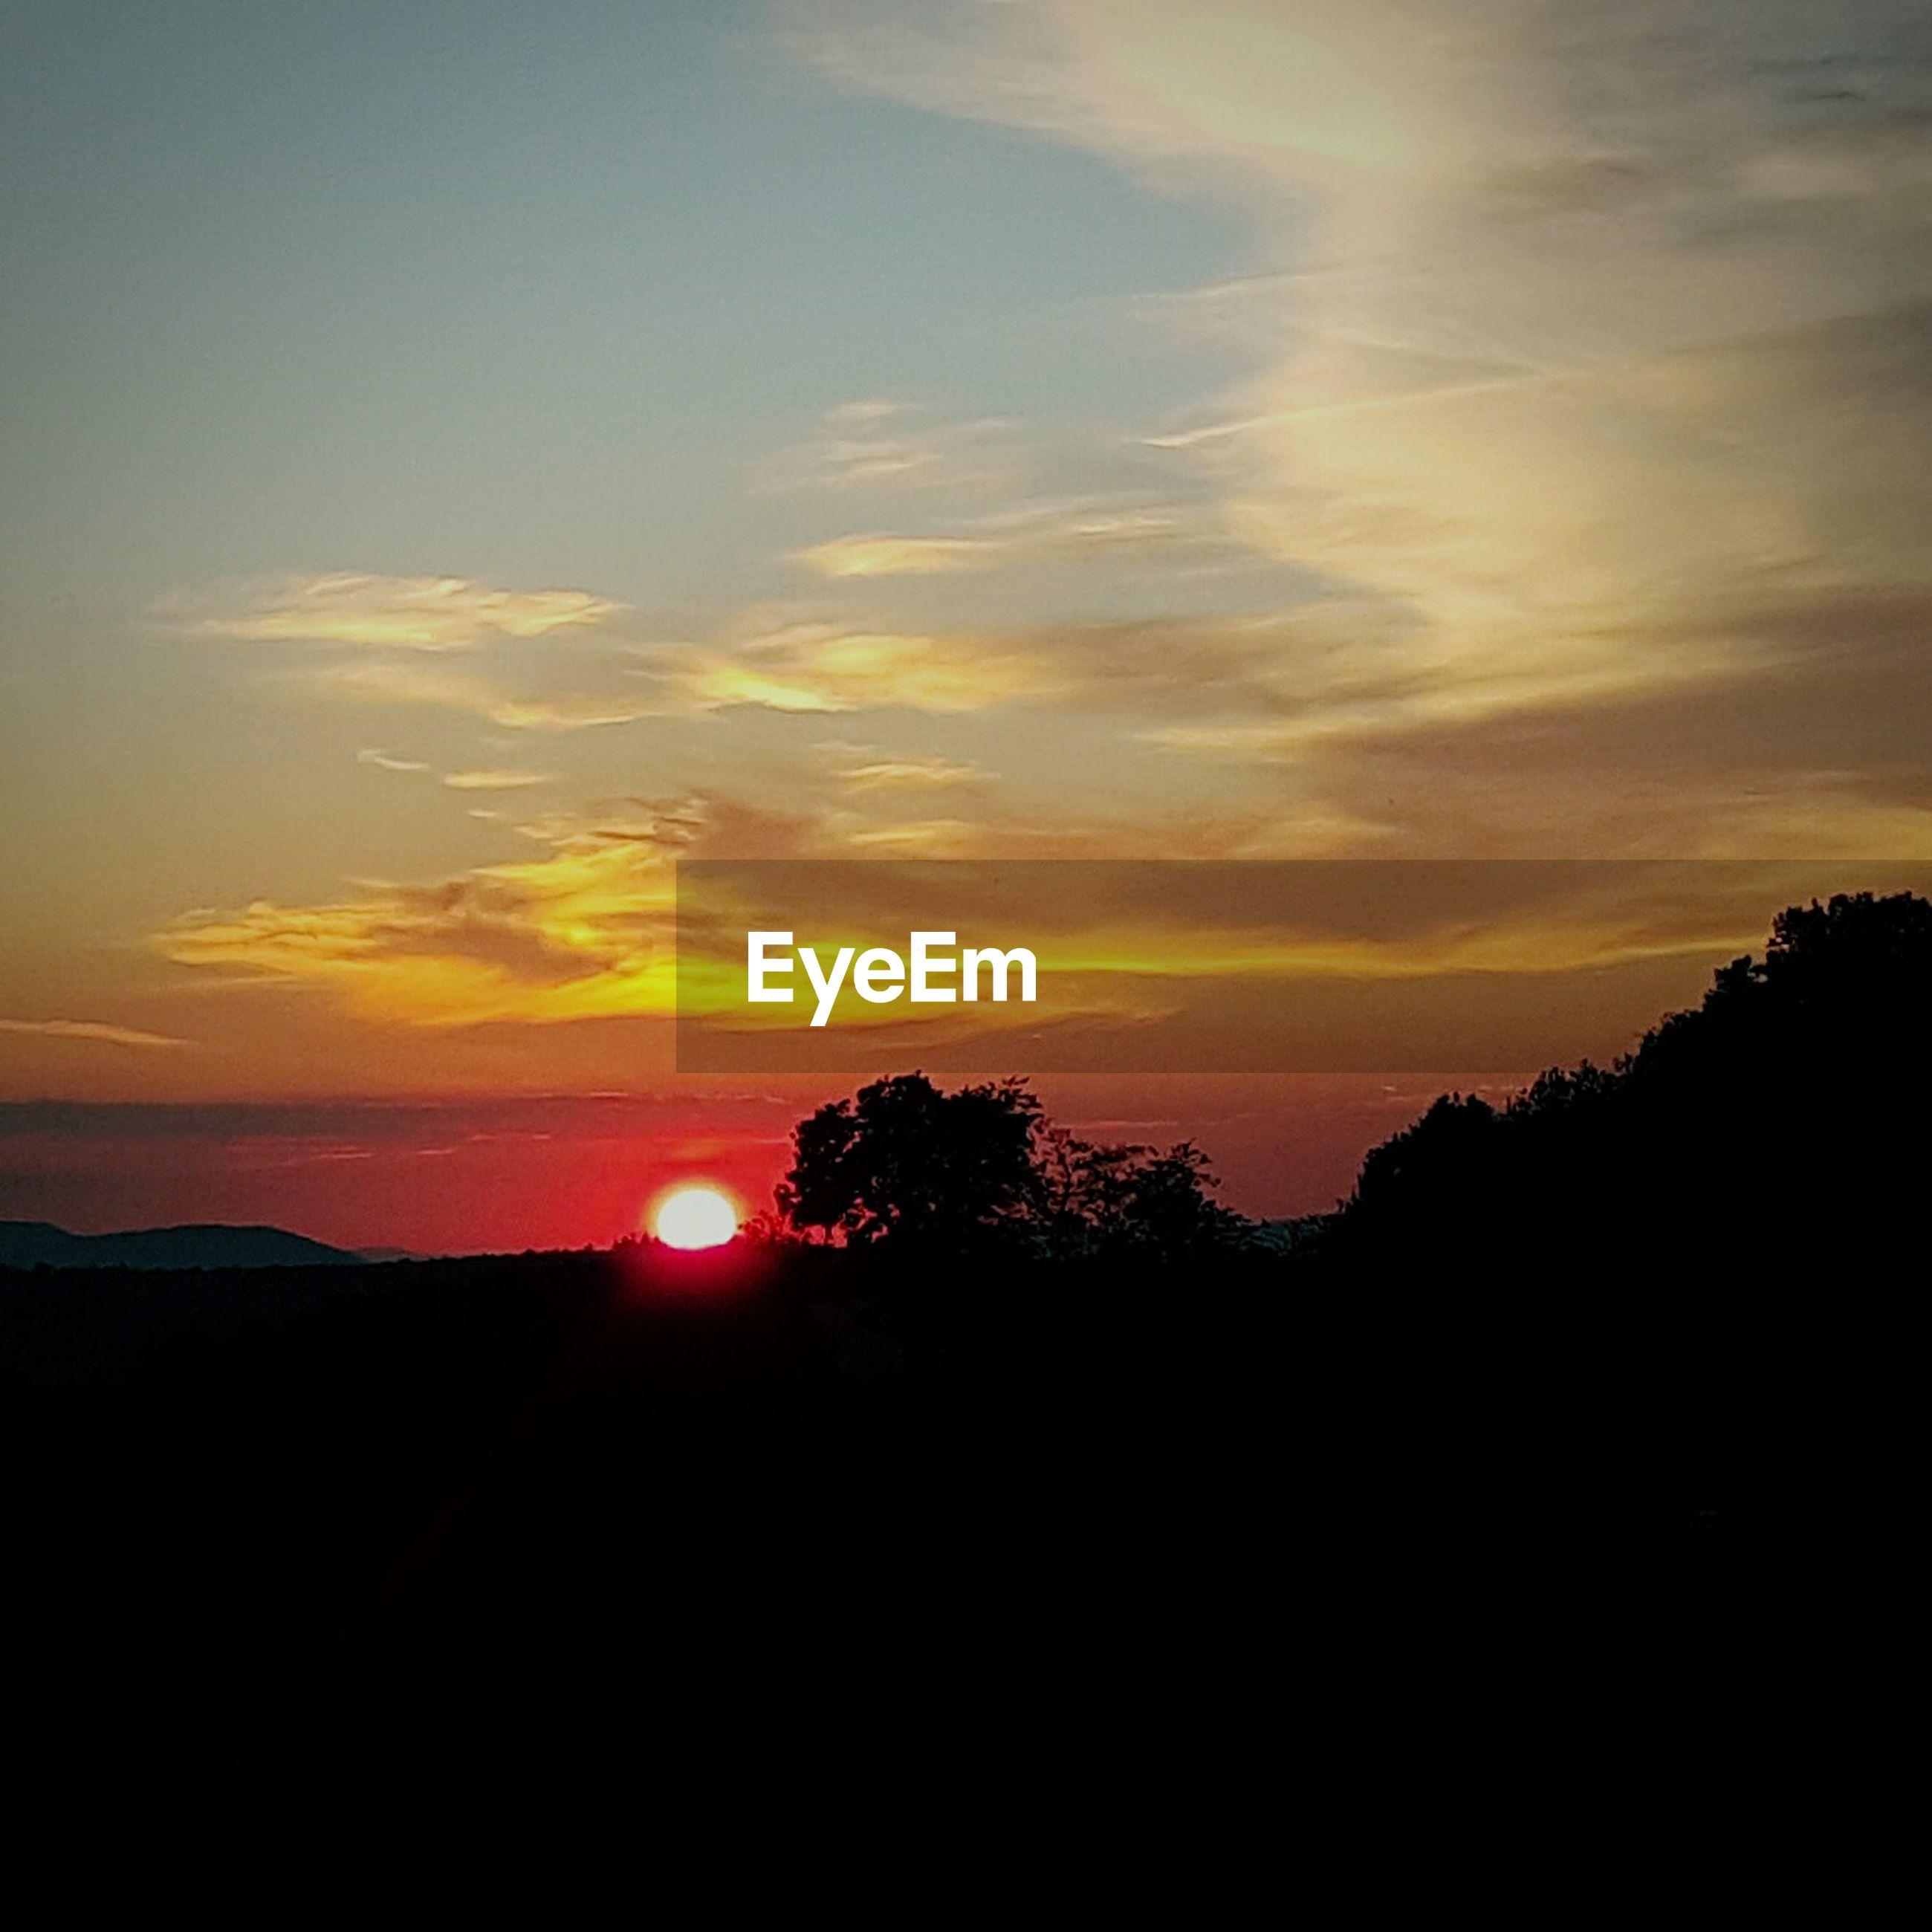 sunset, silhouette, scenics, tranquil scene, sky, tranquility, beauty in nature, orange color, idyllic, sun, nature, cloud - sky, landscape, cloud, dark, tree, outdoors, outline, sunlight, copy space